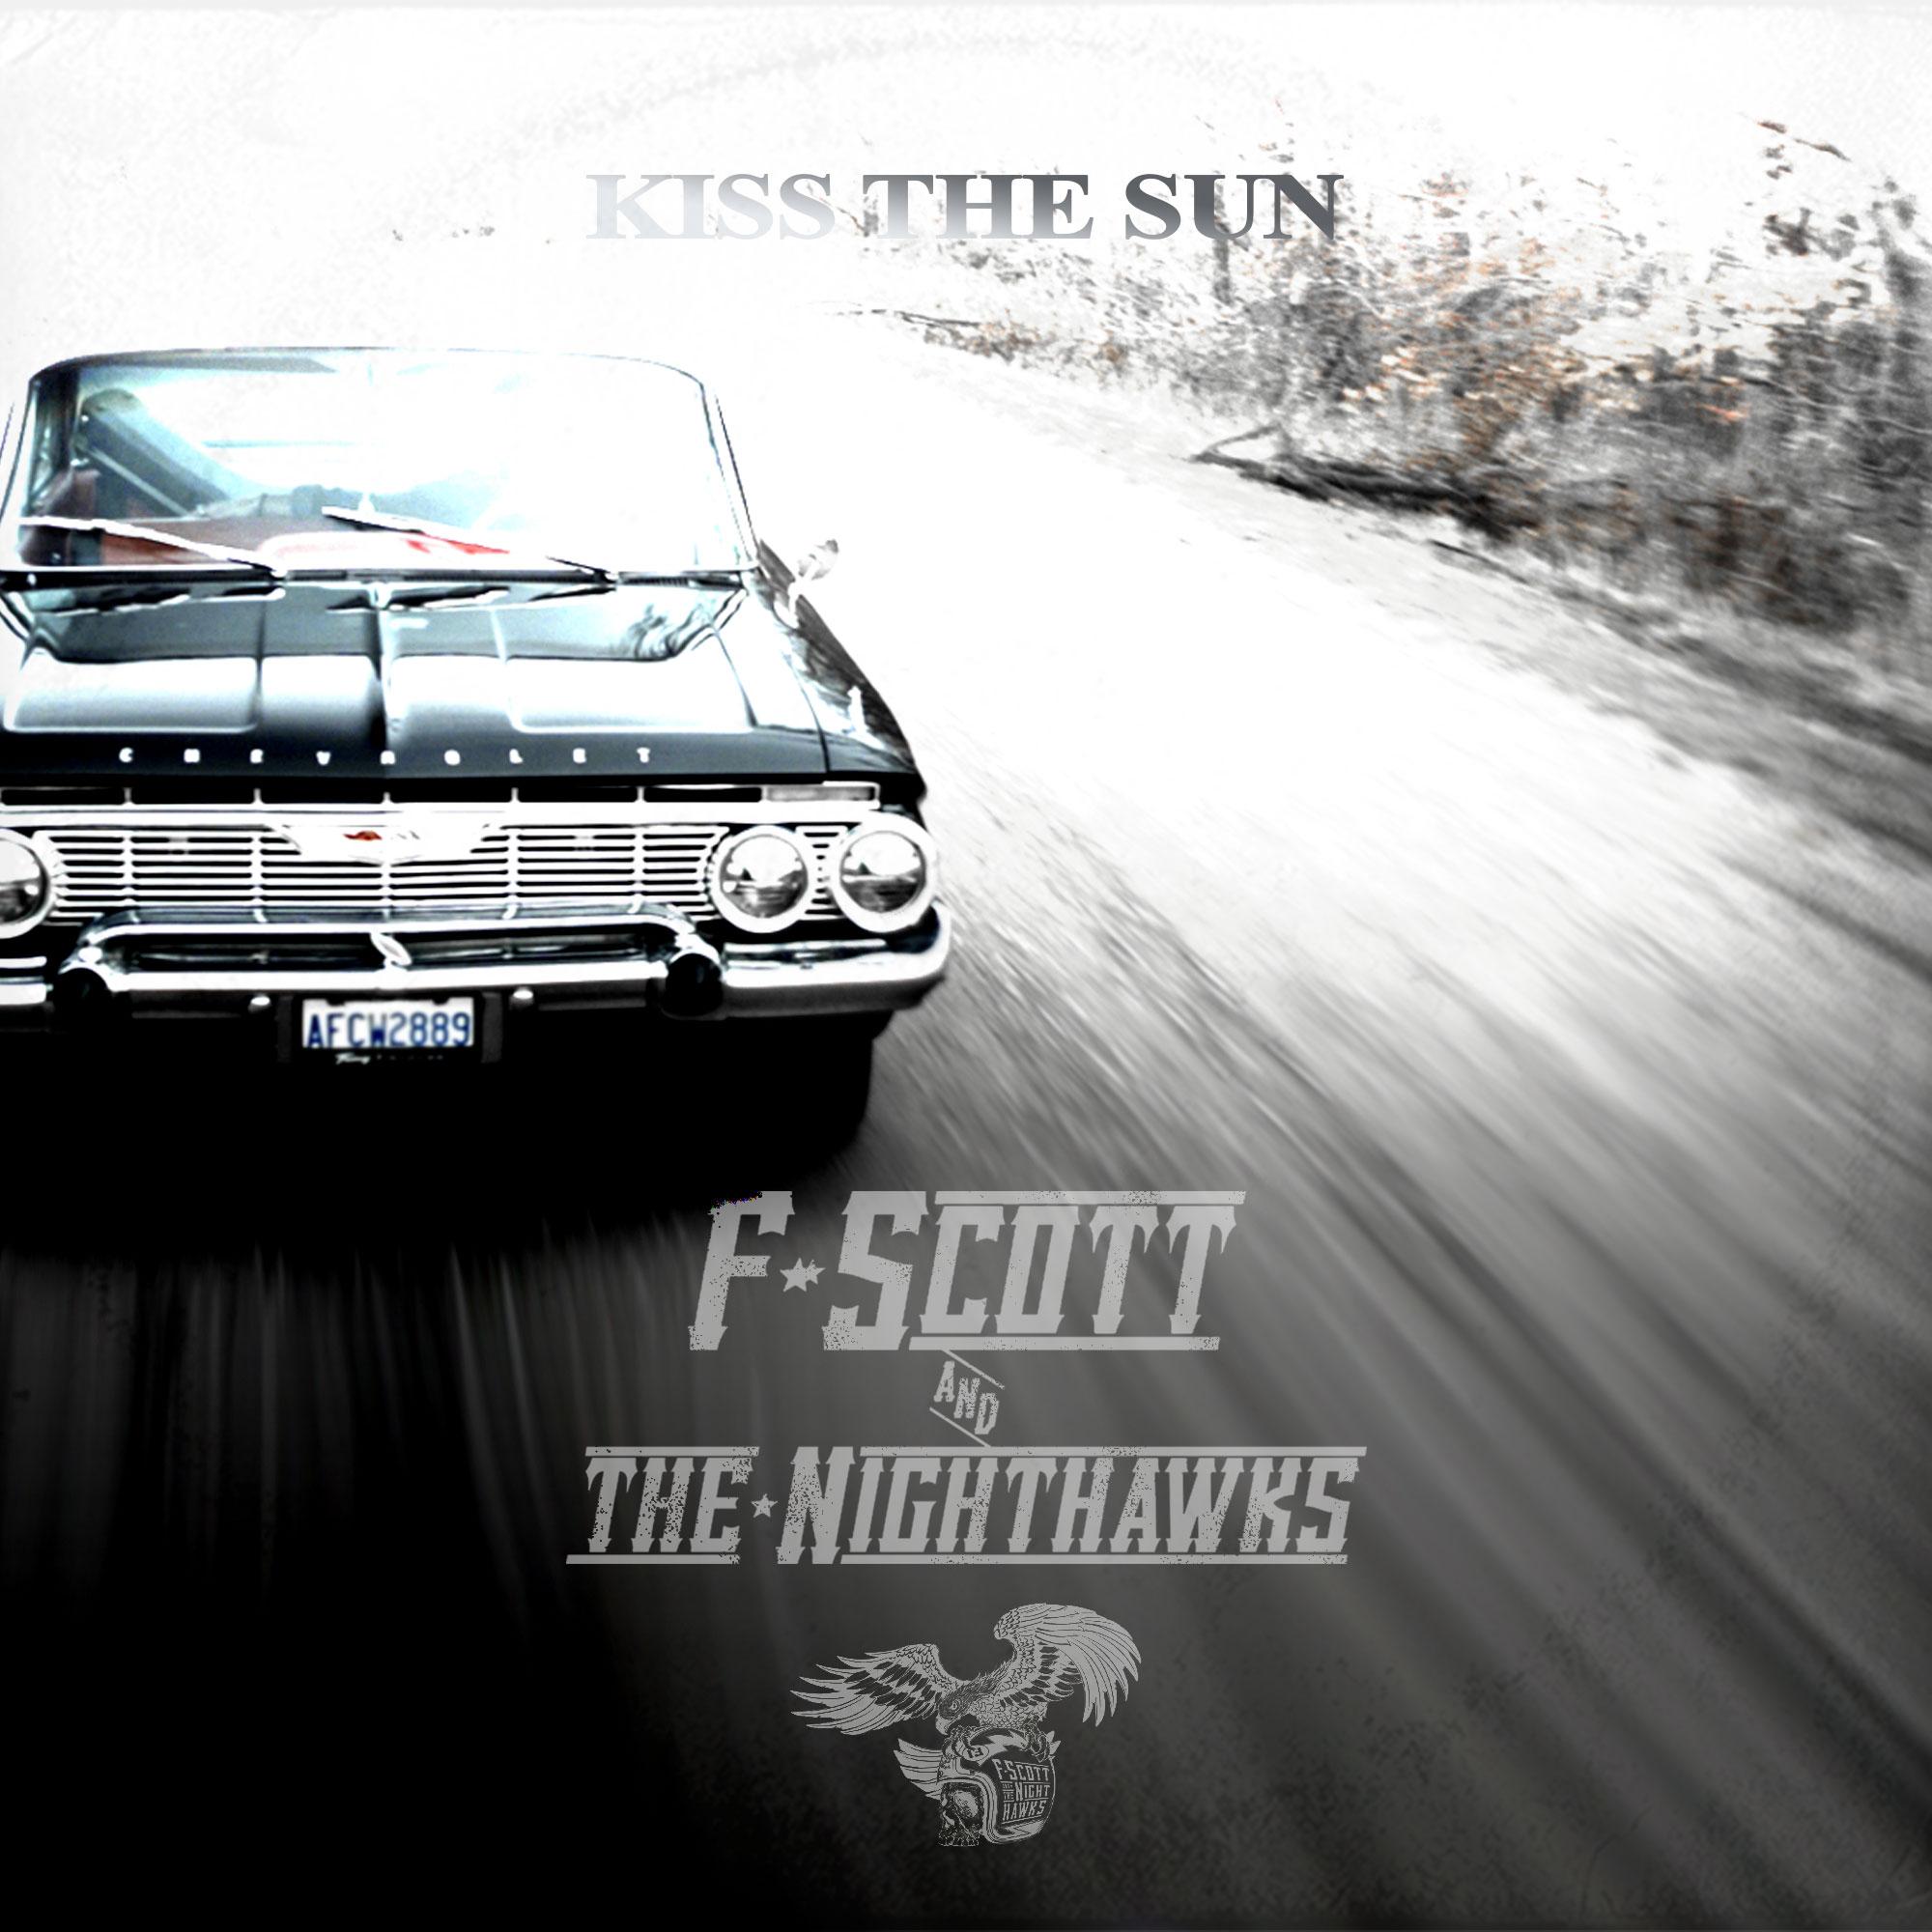 KISSTHESUN-cover.jpg